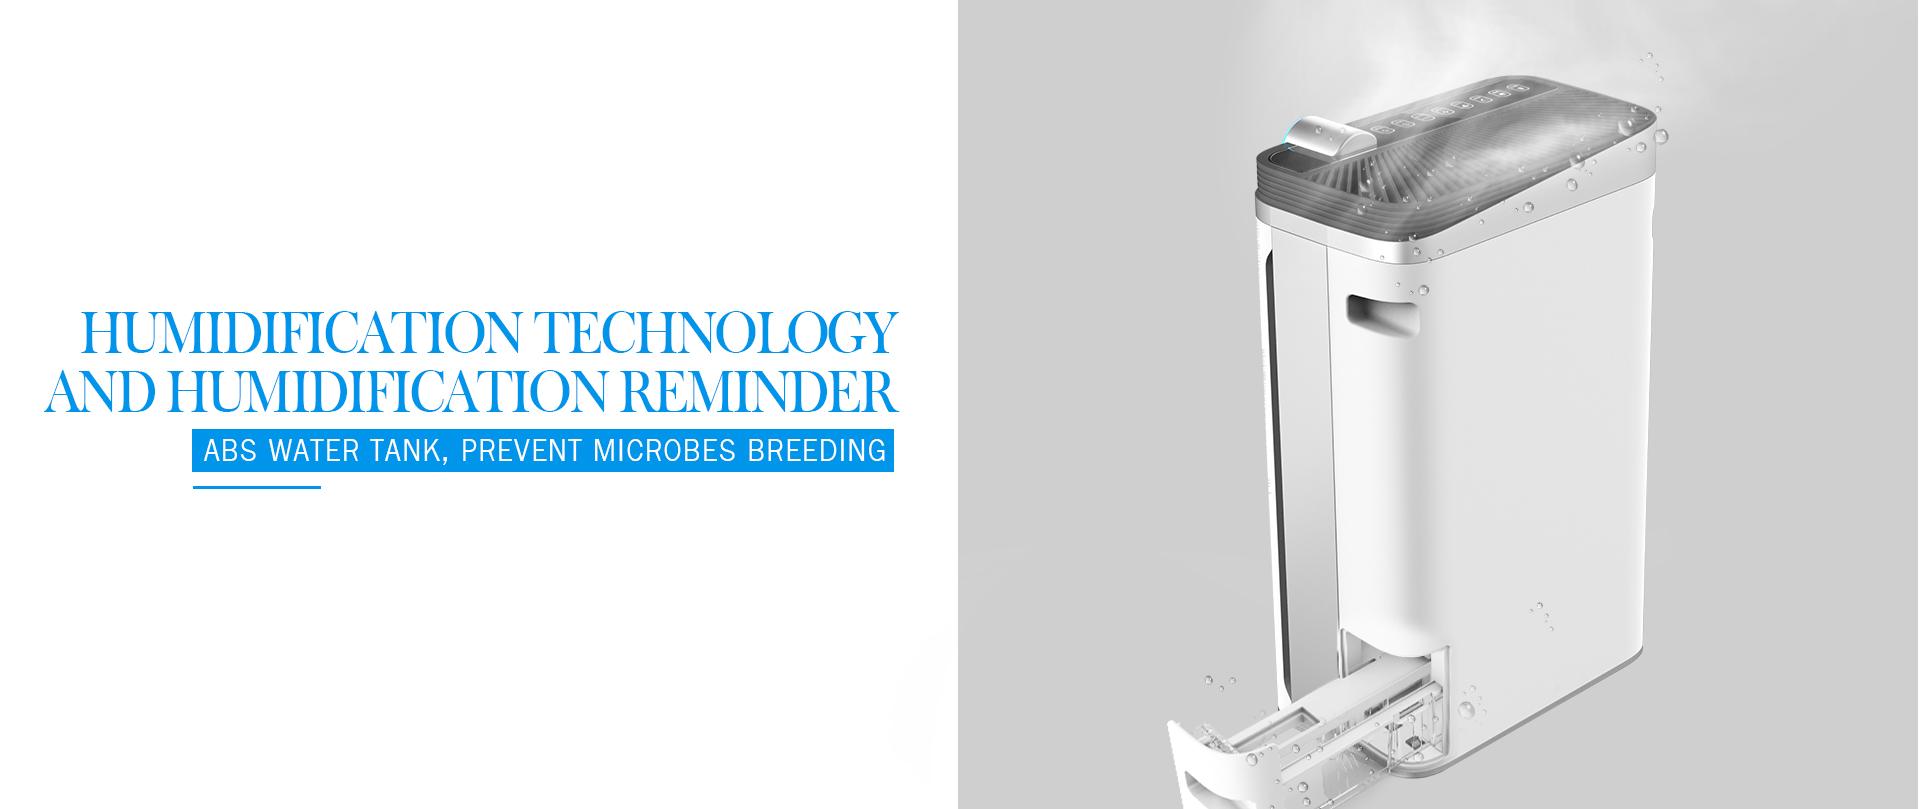 air purifier plasma,plasma air purifier,air purifier home